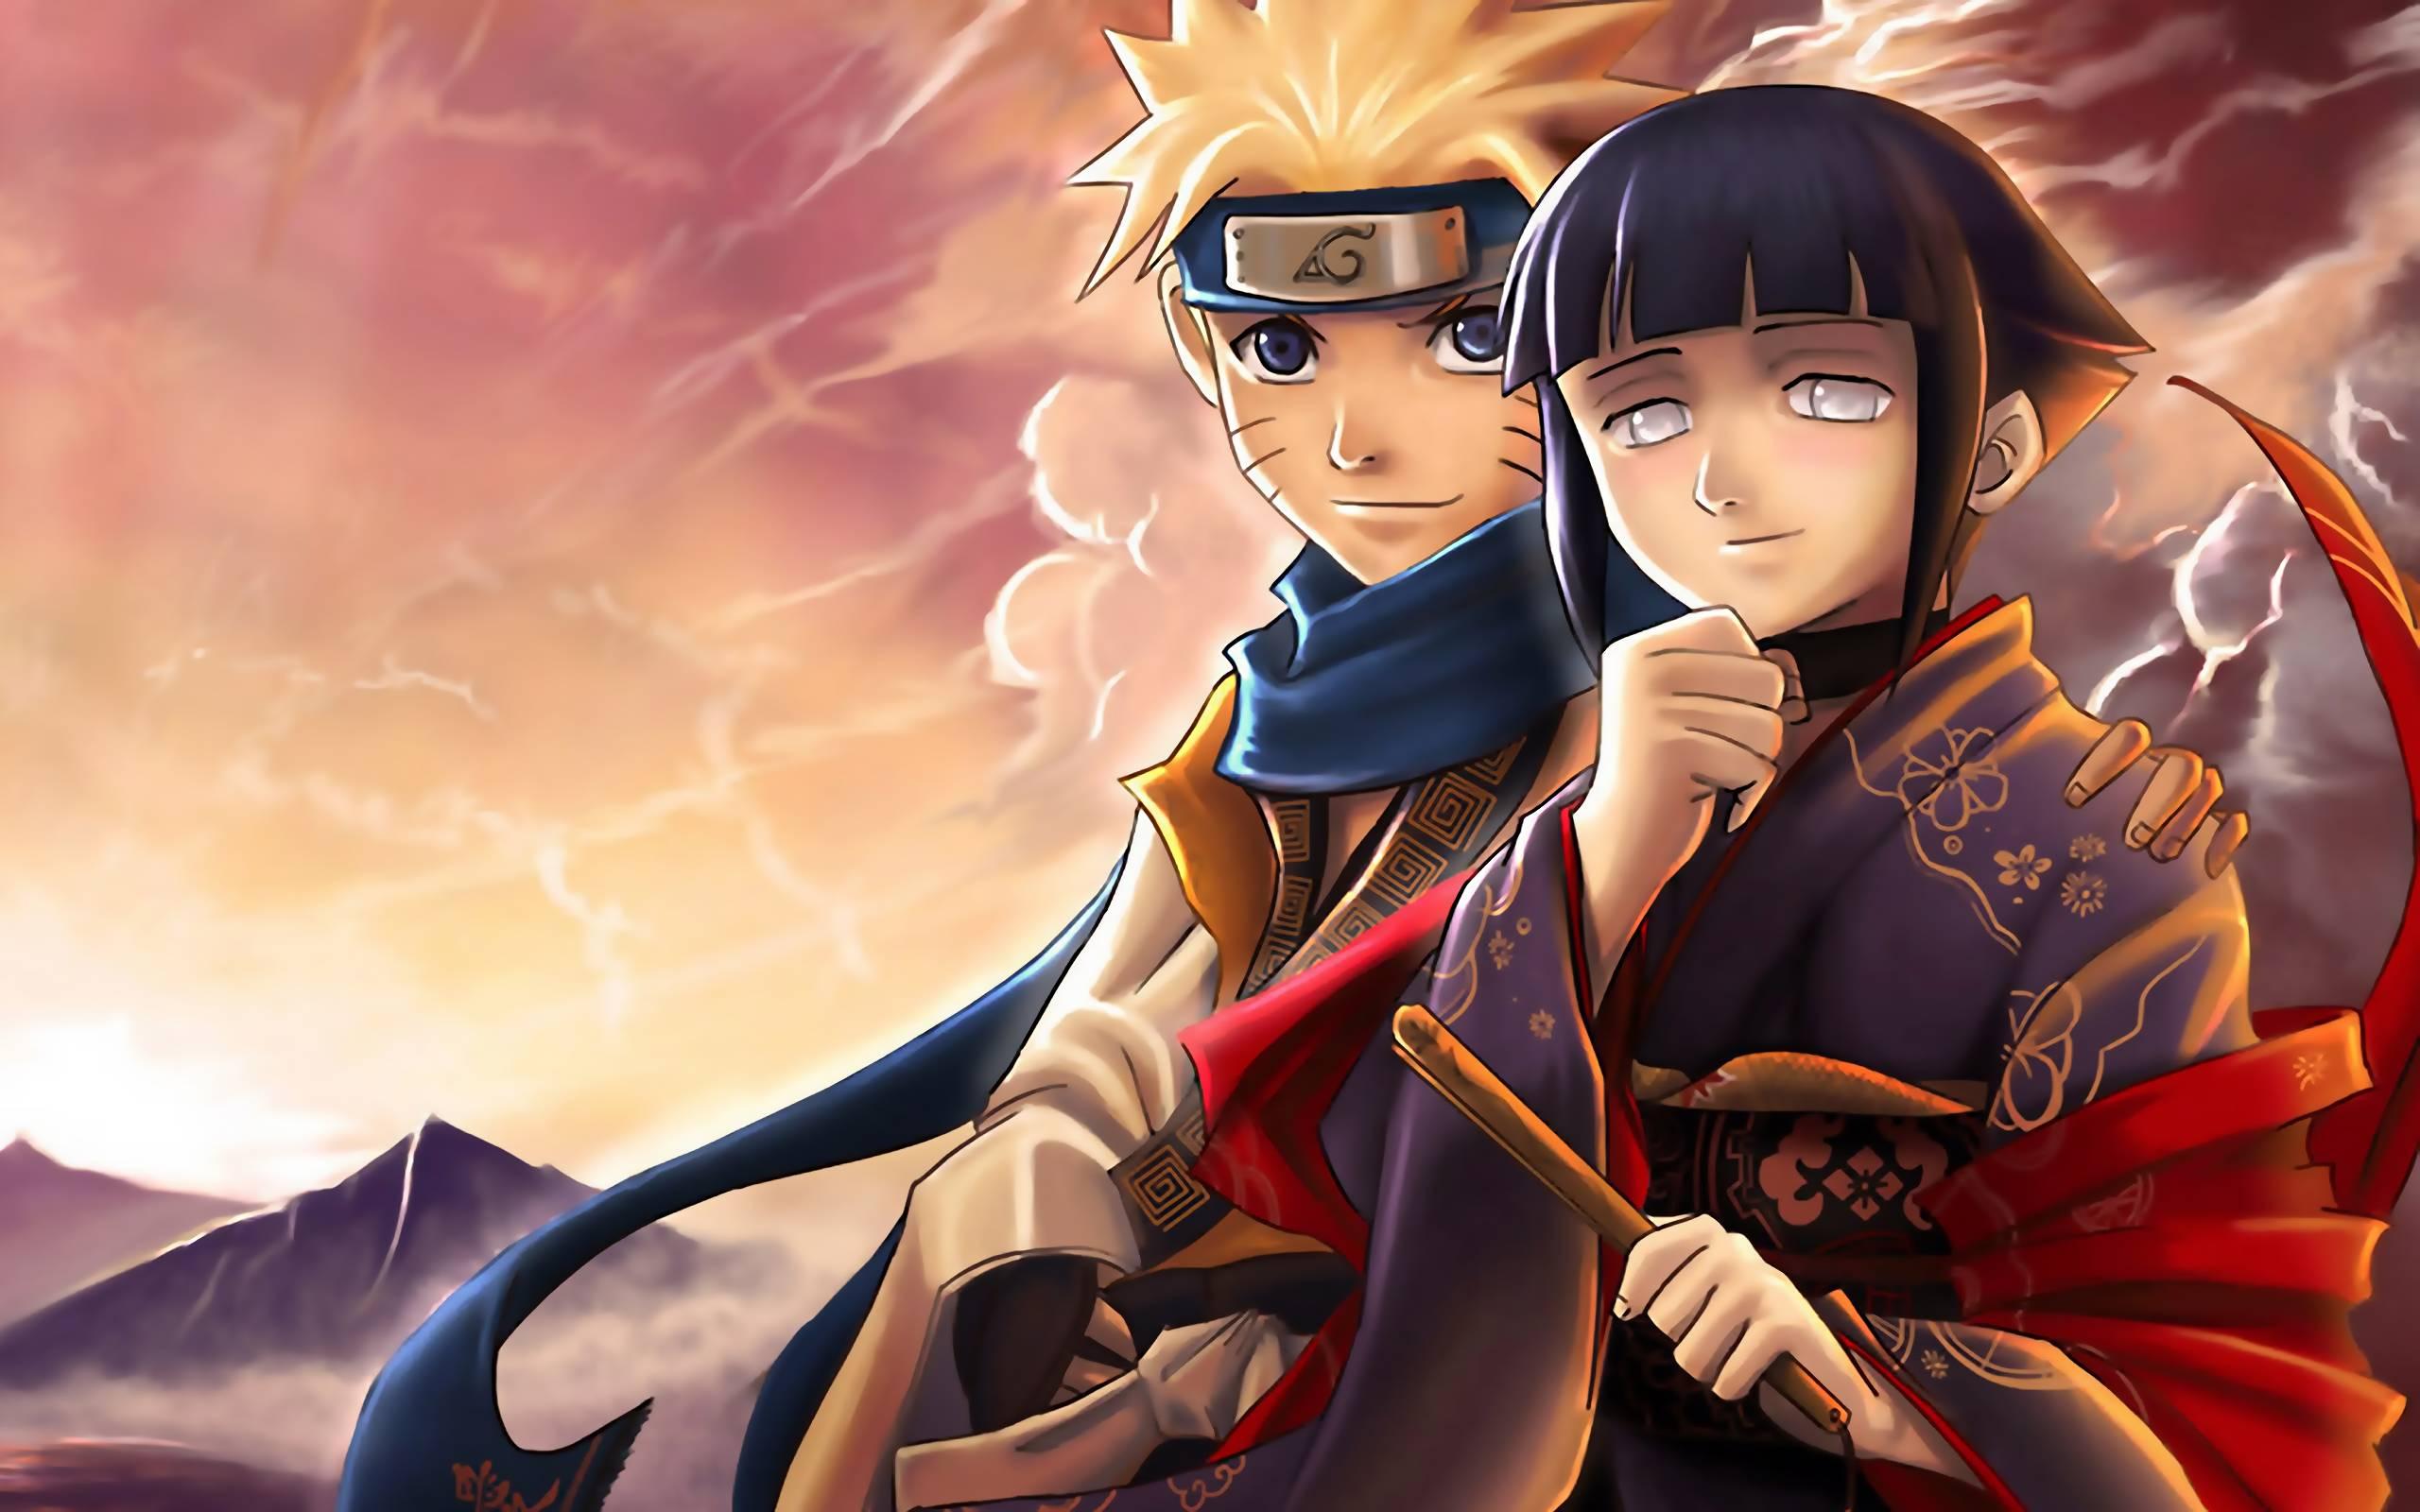 Naruto Hd wallpaper 64801 2560x1600